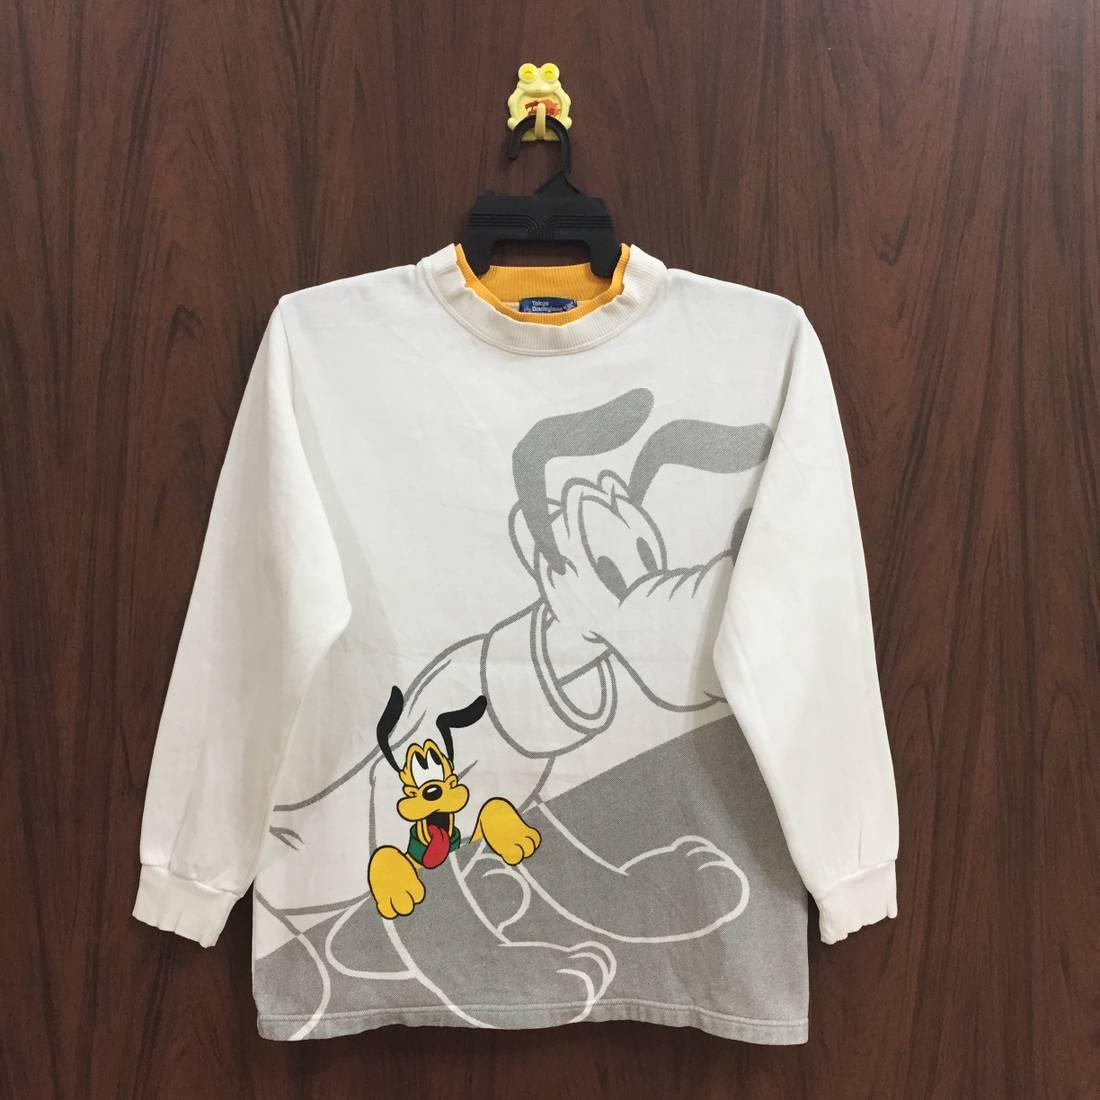 Vintage Mickey Mouse and pluto walt disney crewneck big logo sweatshirt jumper jacket L size u3L9Dg